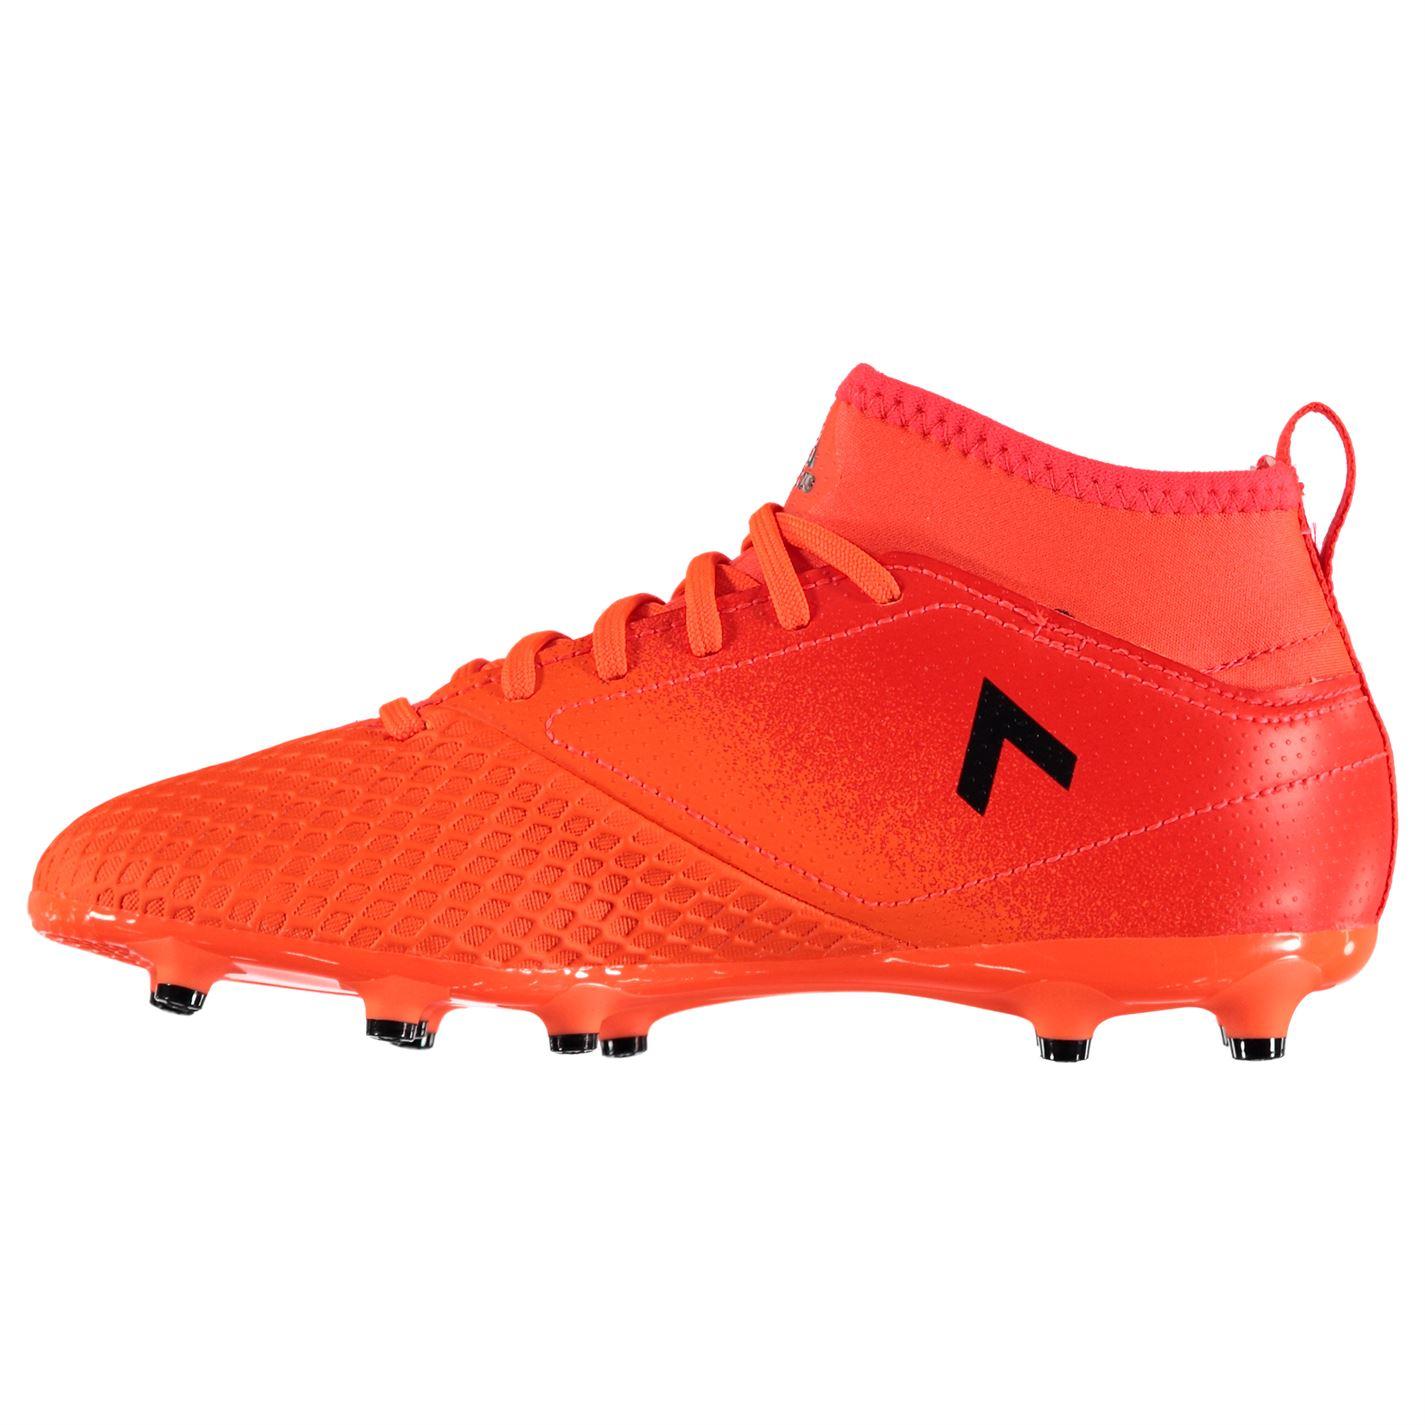 5aa9bdc12 discount adidas mens ace 17.3 primemesh sg footbal shoes red ftwr white core  04d9c f6fbe; sale adidas ace 17 3 mesh fg childrens boys 881f3 49e8a